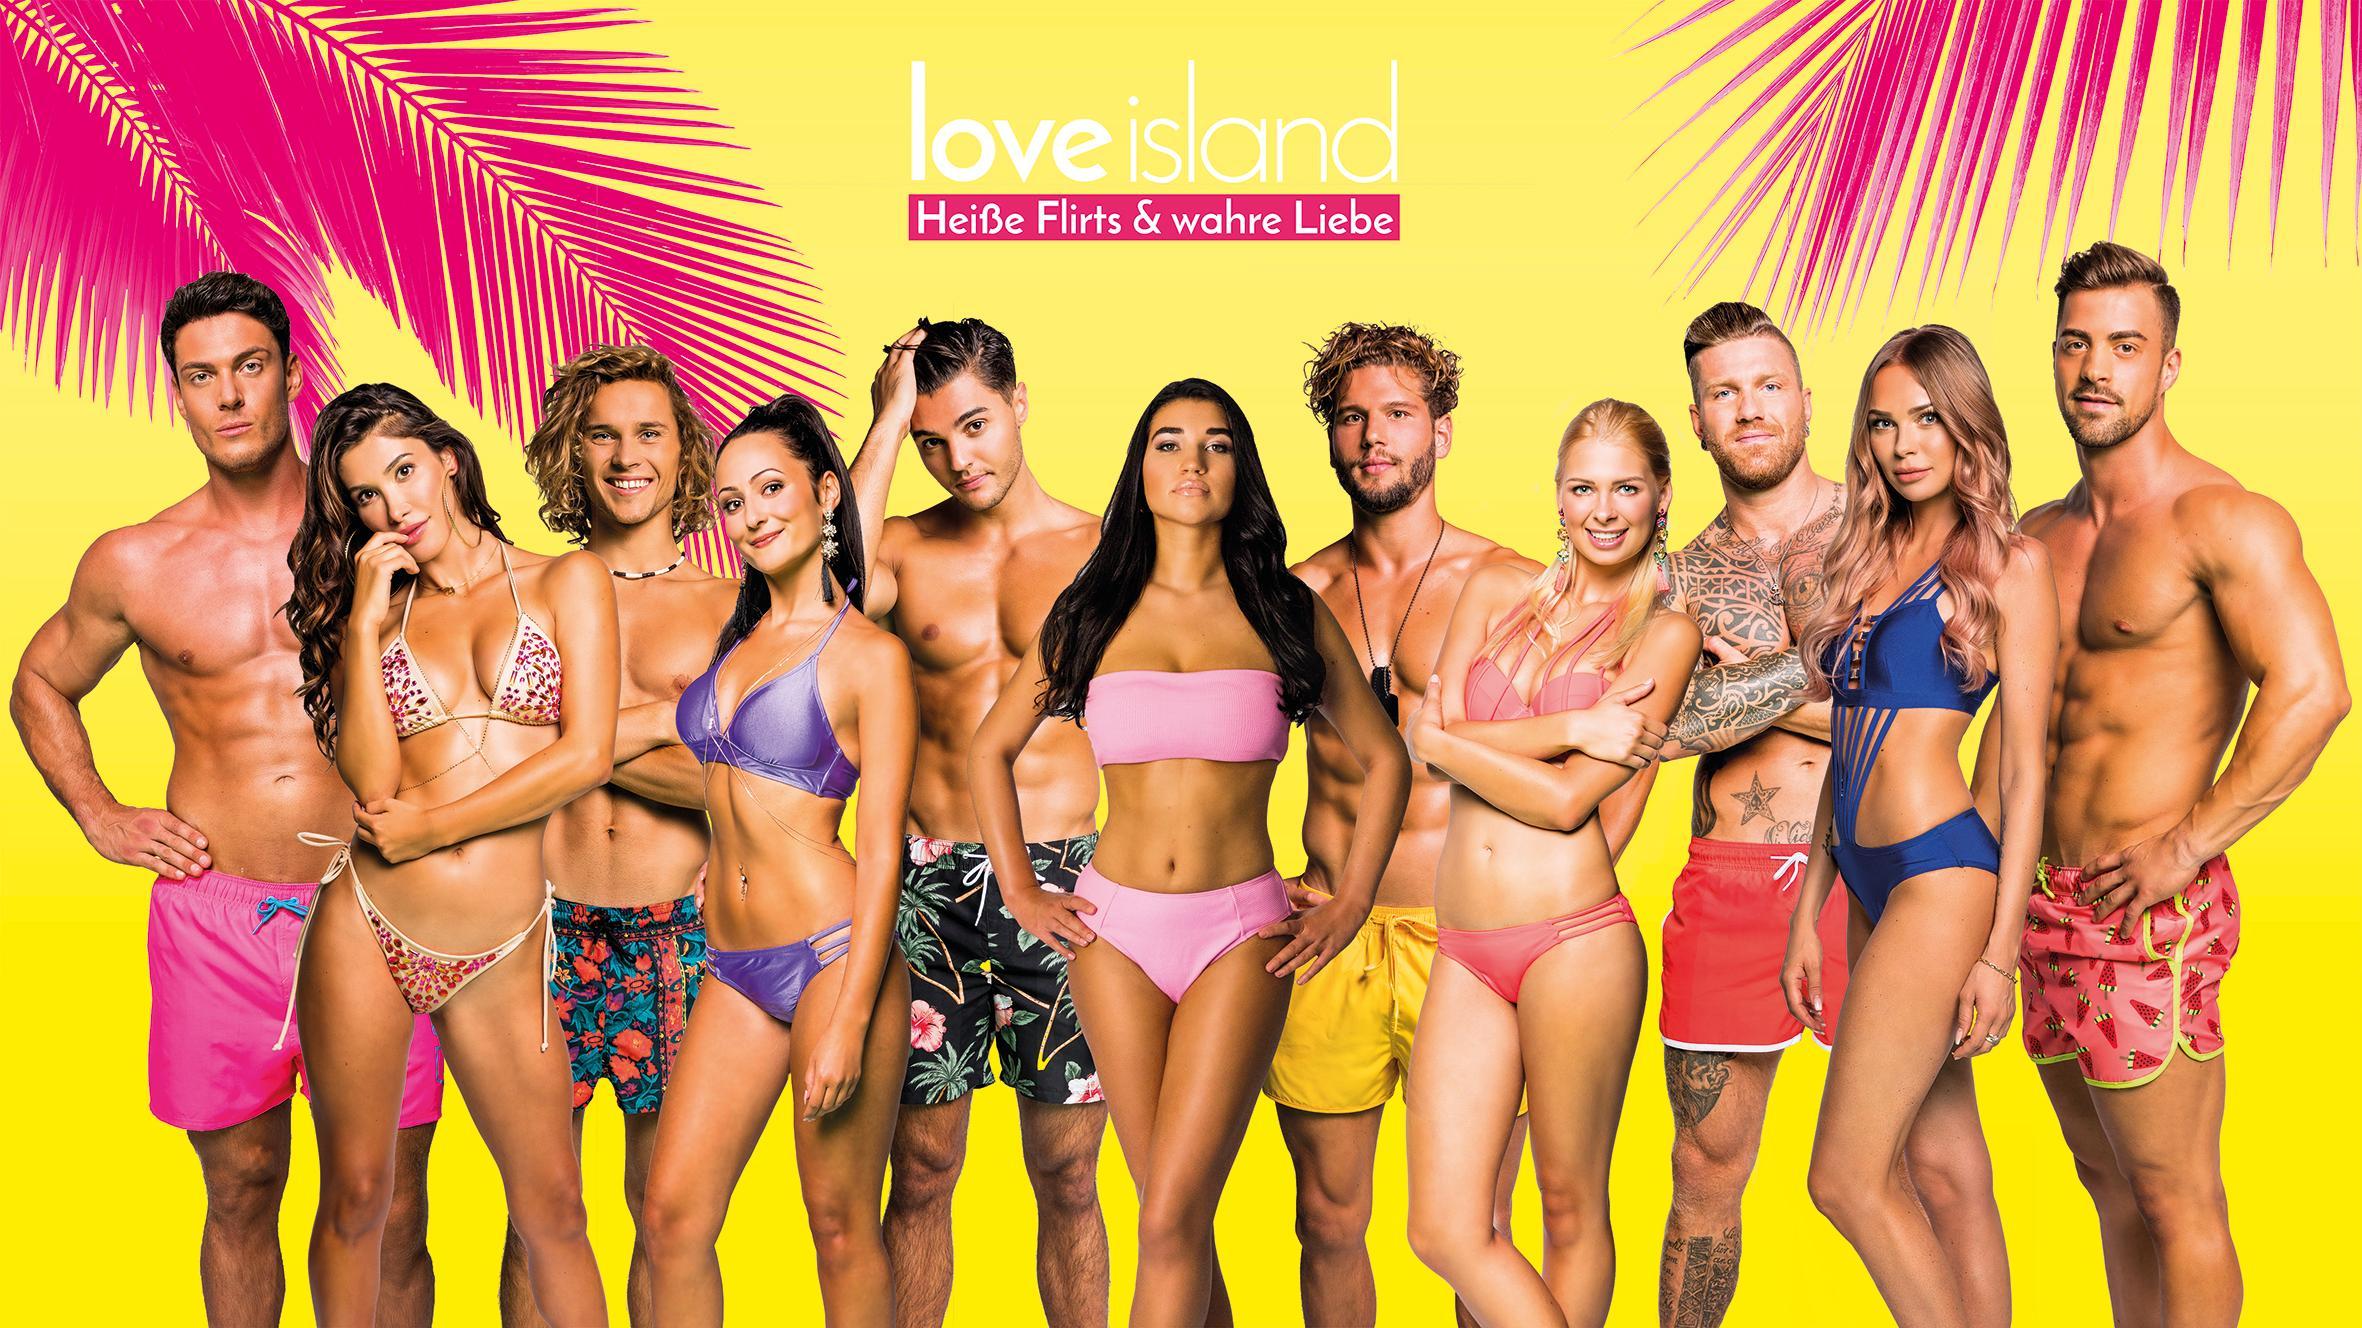 love island nackt szene